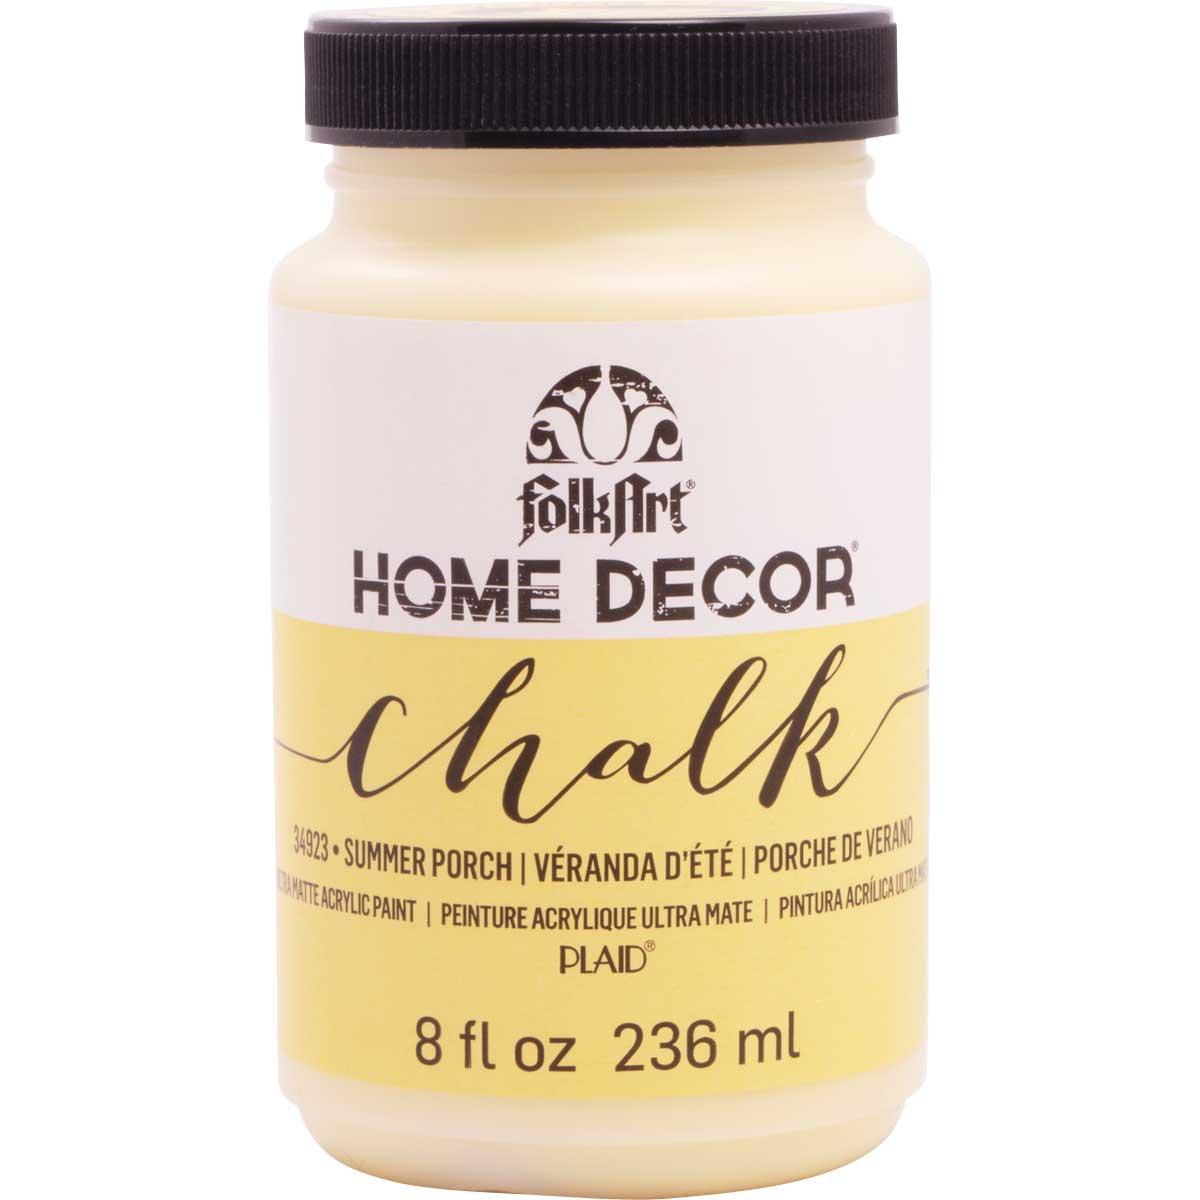 FolkArt ® Home Decor™ Chalk - Summer Porch, 8 oz.